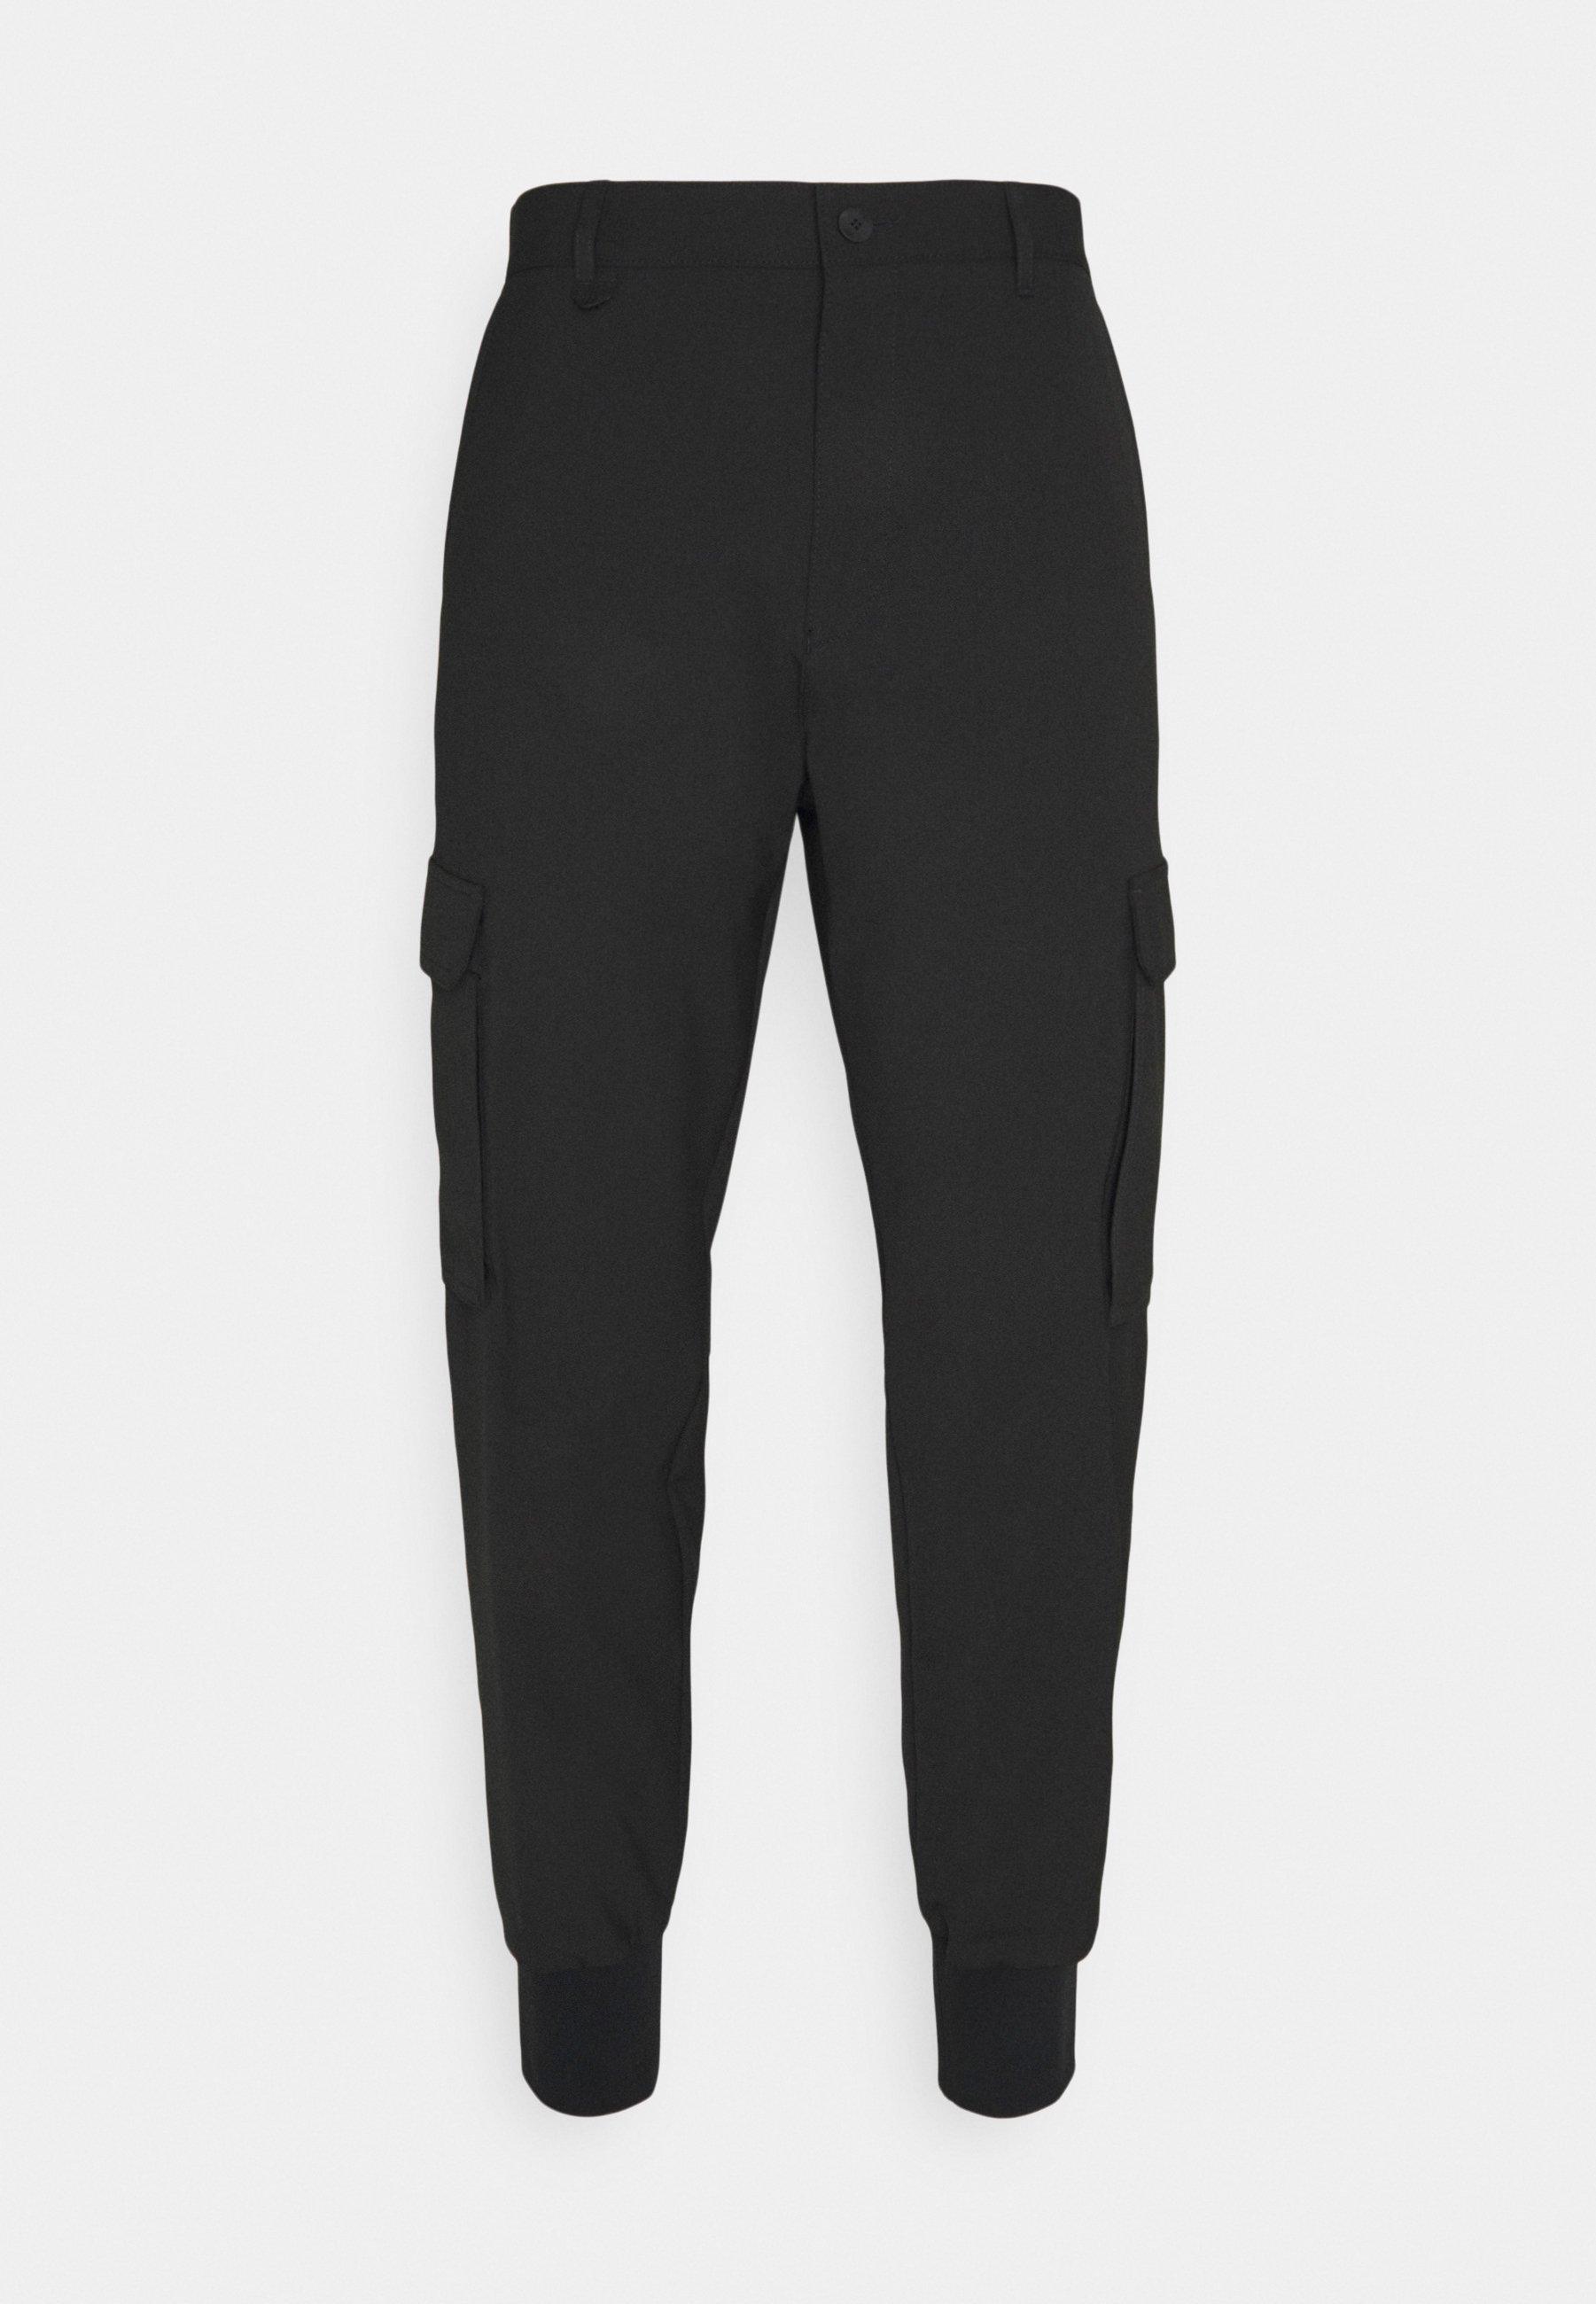 Homme GLAVIN - Pantalon cargo